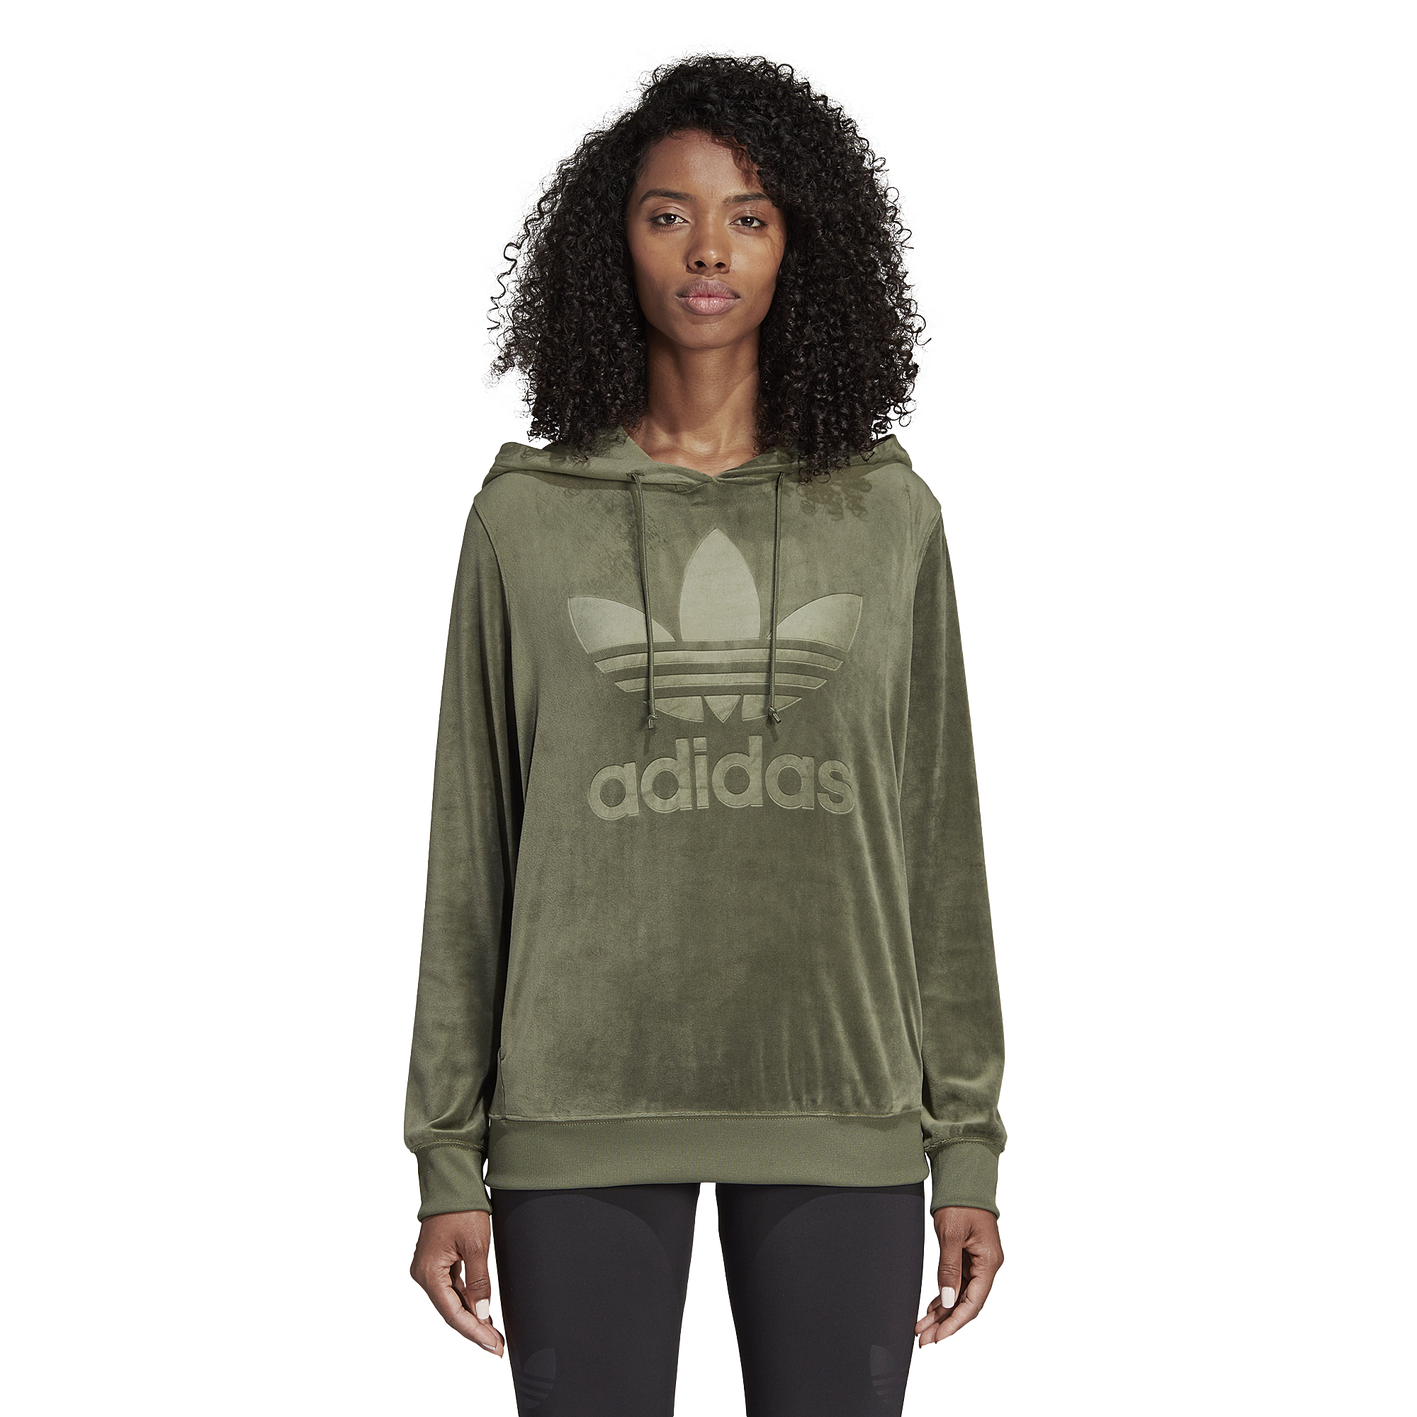 aaf97cc8a adidas Originals Winter Ease Velvet Hoodie - Women's - Casual ...